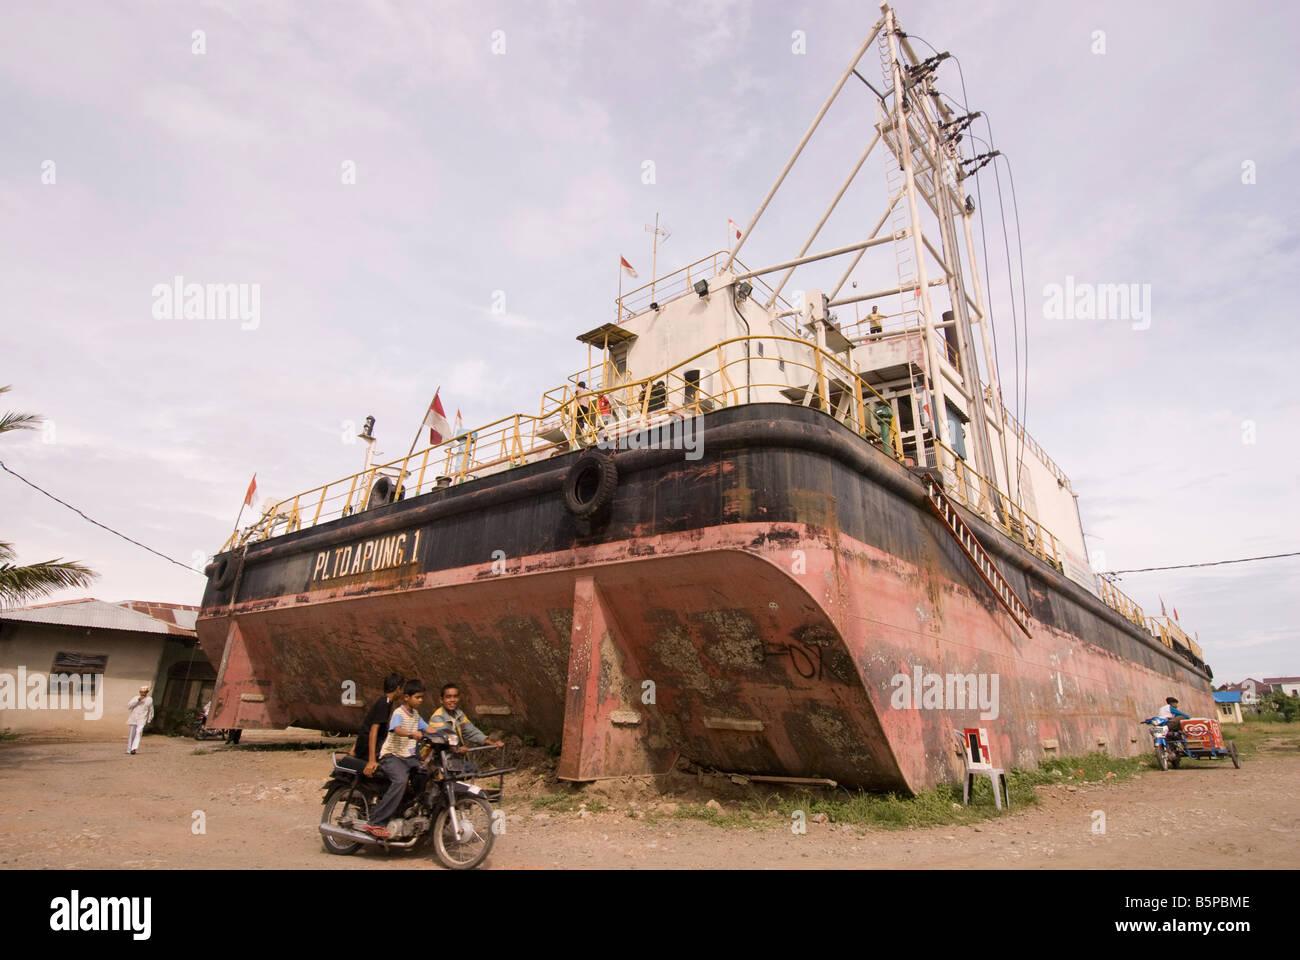 Floating Electric Generator Ship - caused by tsunami located in Kampung Bunge Blangcut, Jayabaru, Banda Aceh, Sumatra, Stock Photo